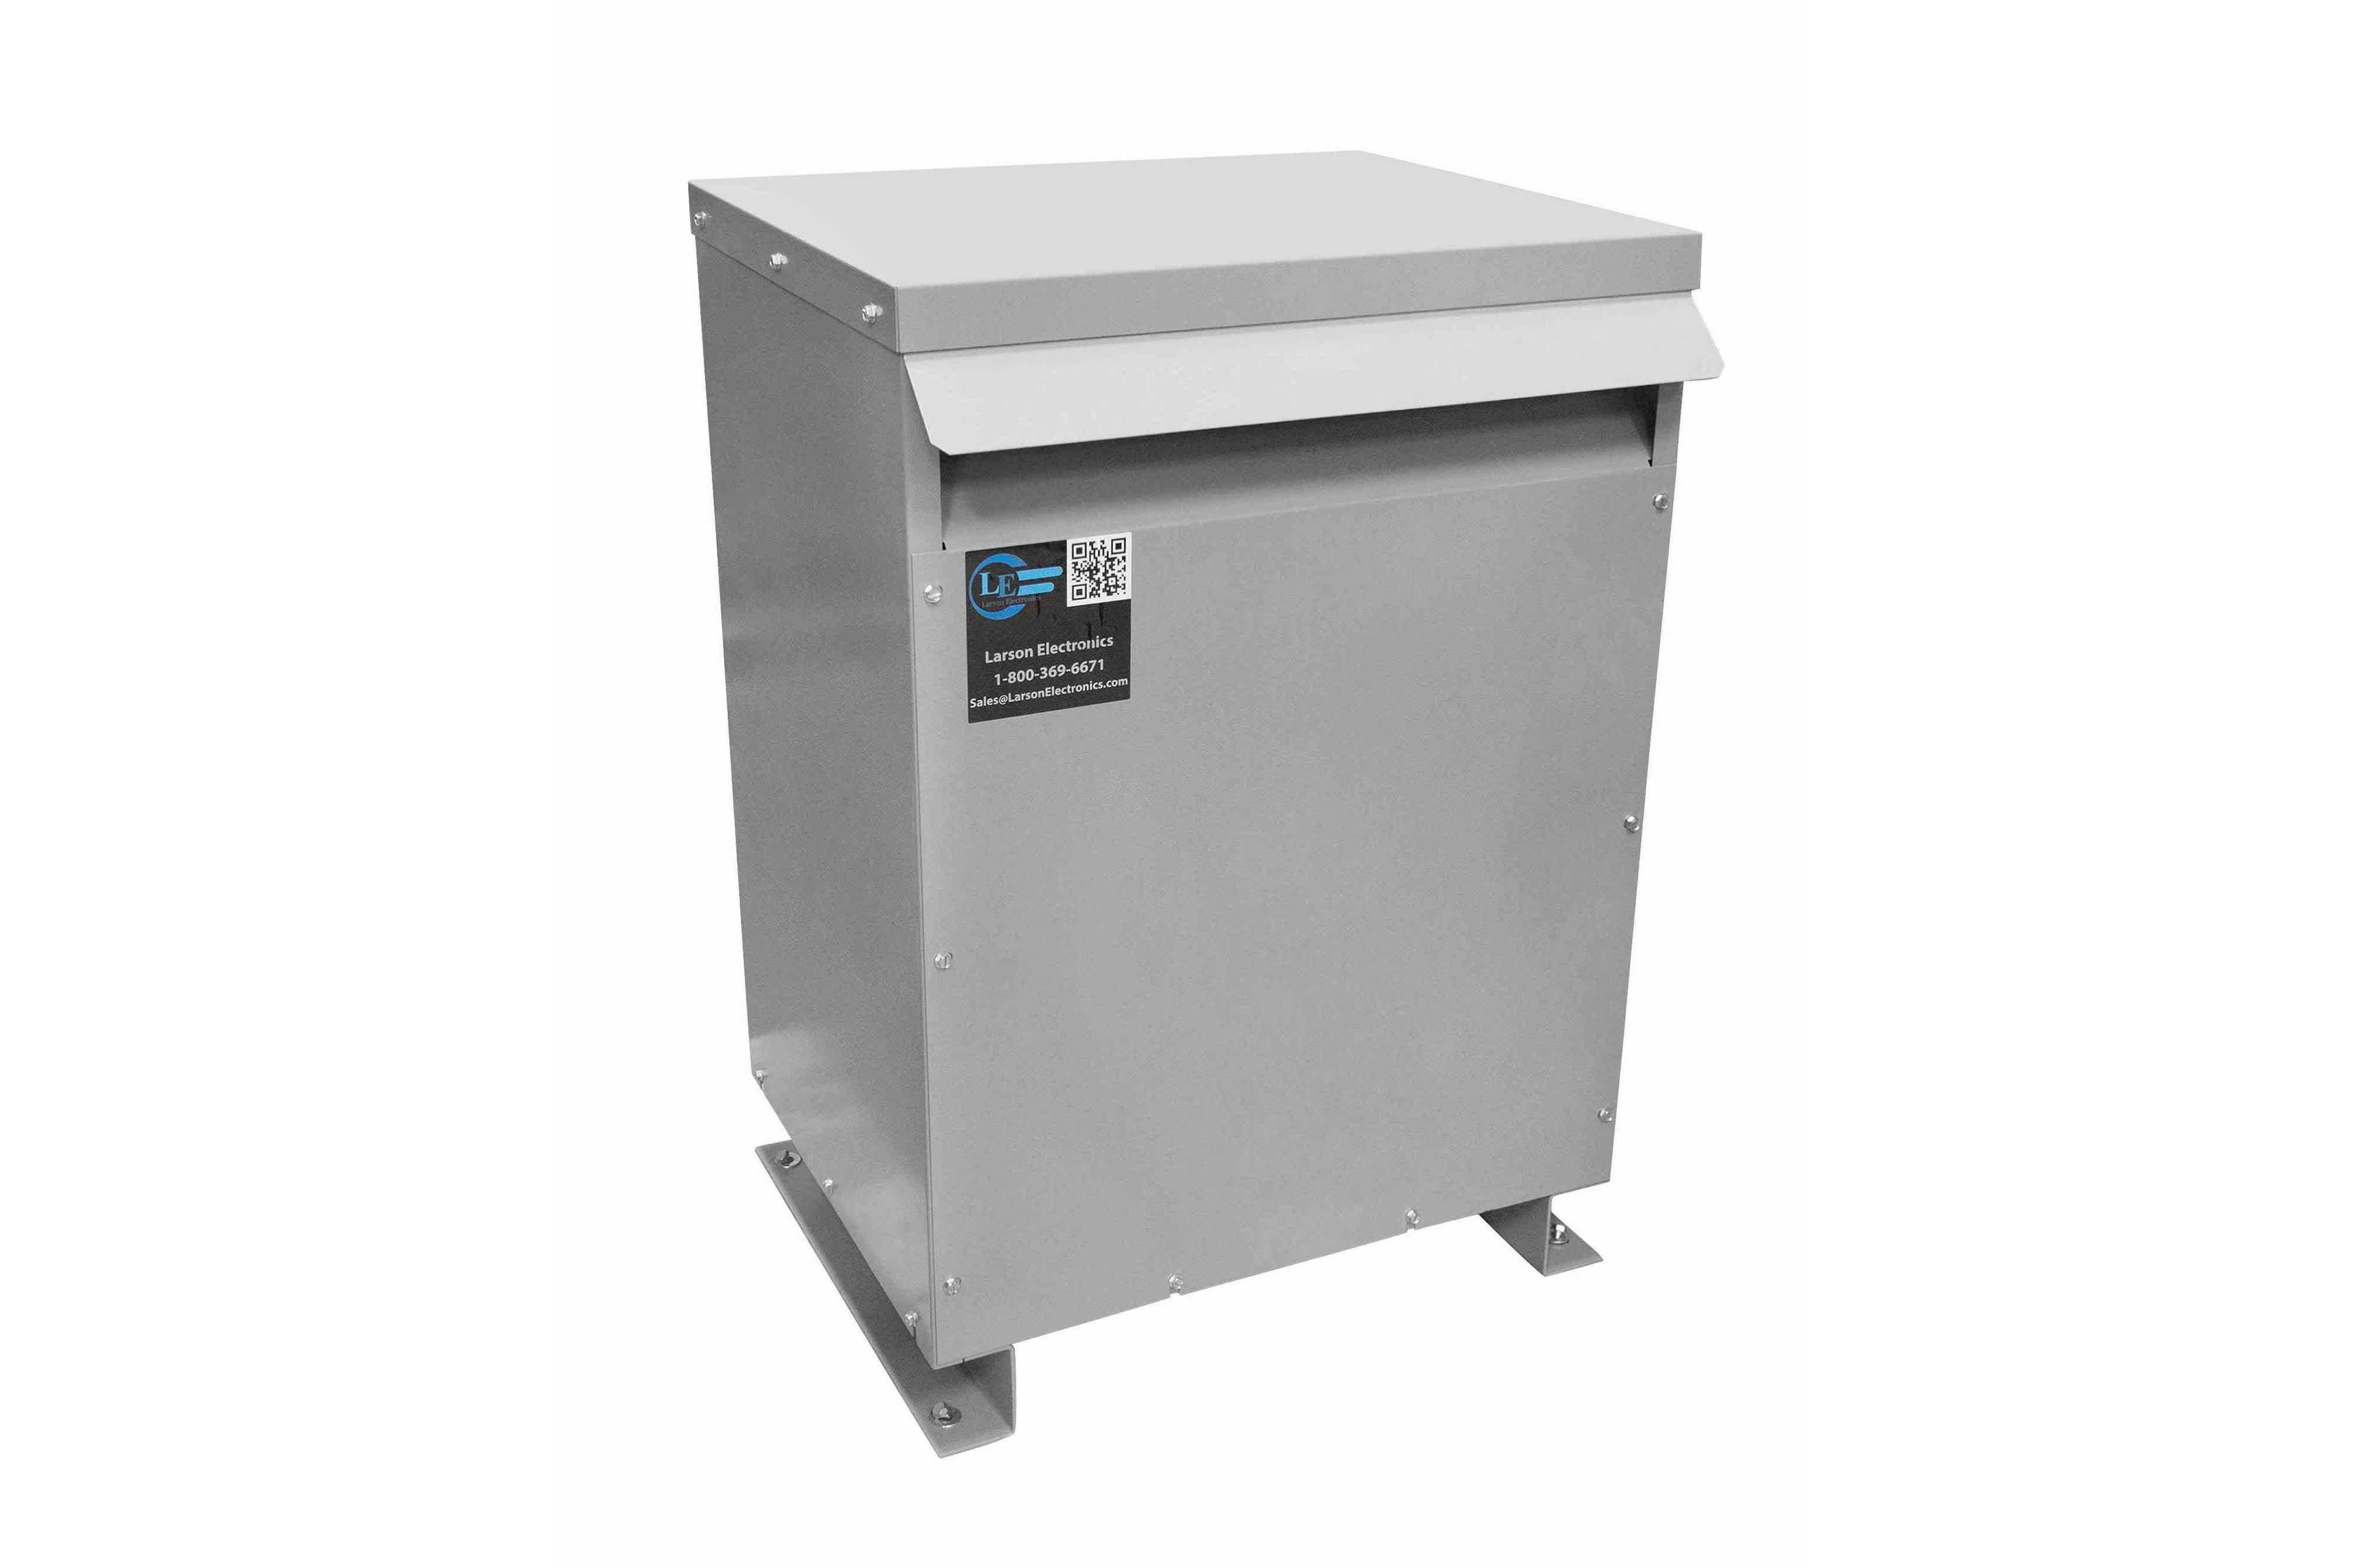 20 kVA 3PH DOE Transformer, 208V Delta Primary, 380Y/220 Wye-N Secondary, N3R, Ventilated, 60 Hz